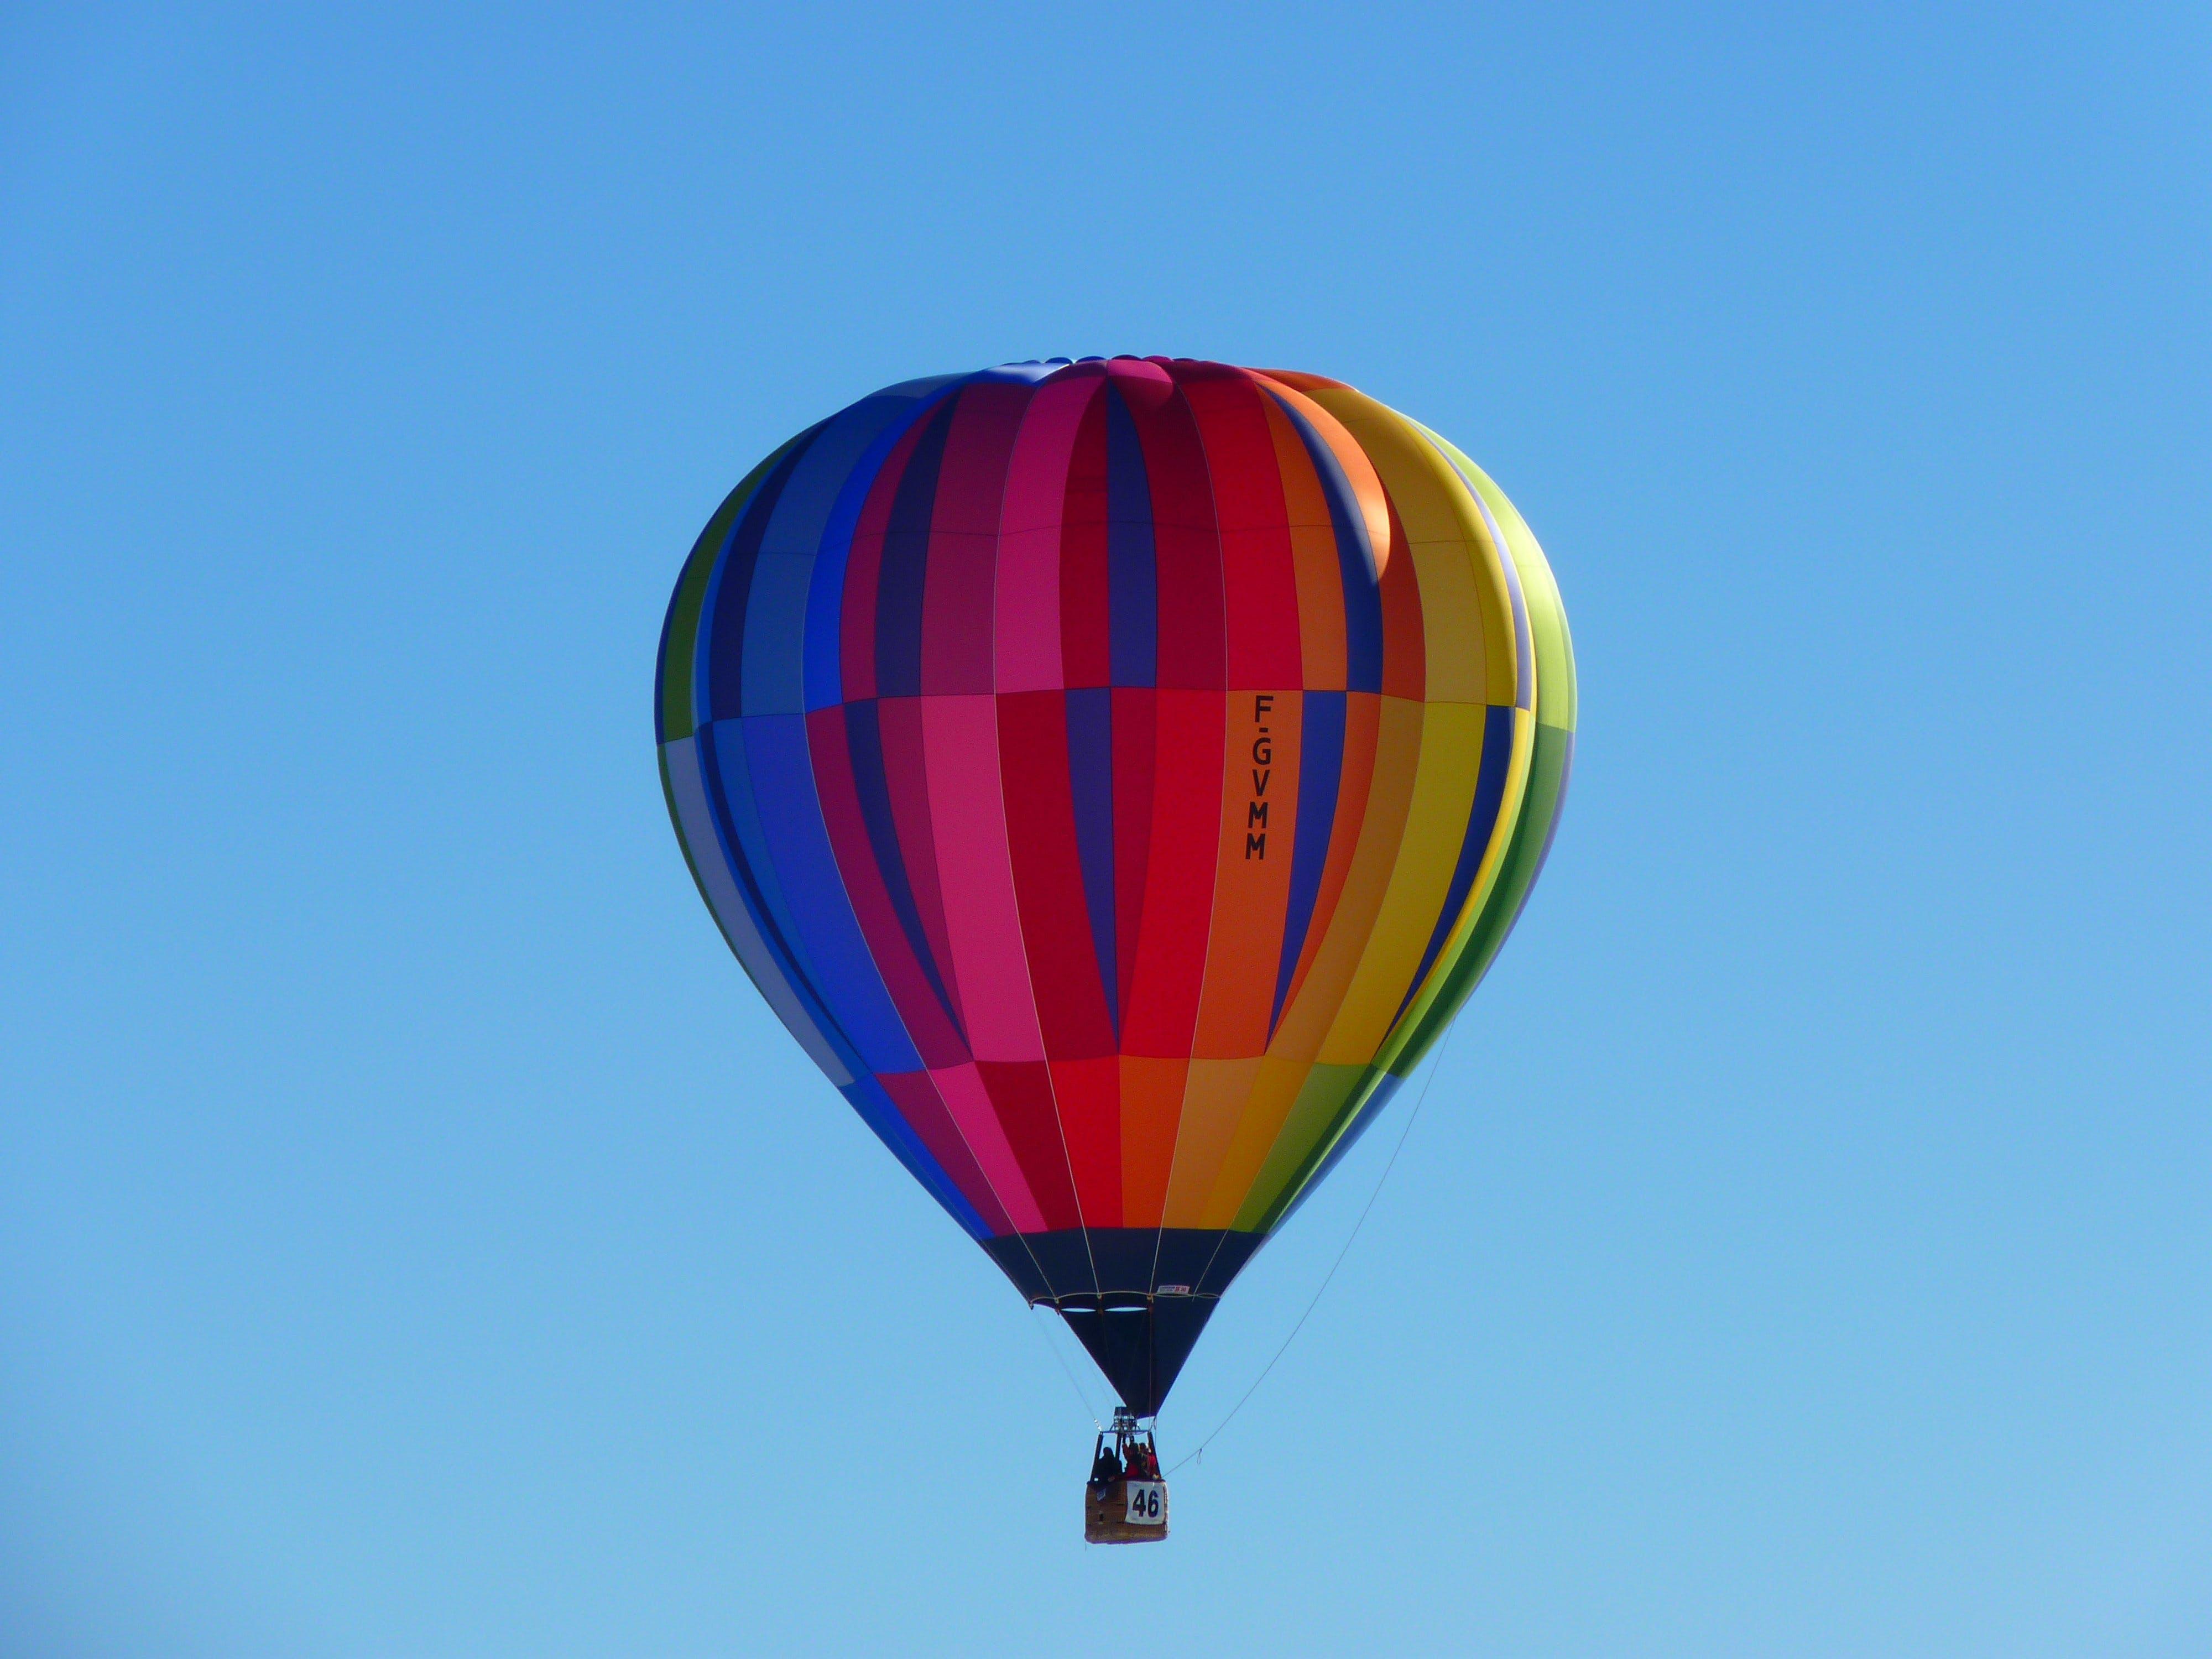 ballon, eventyr, farverig